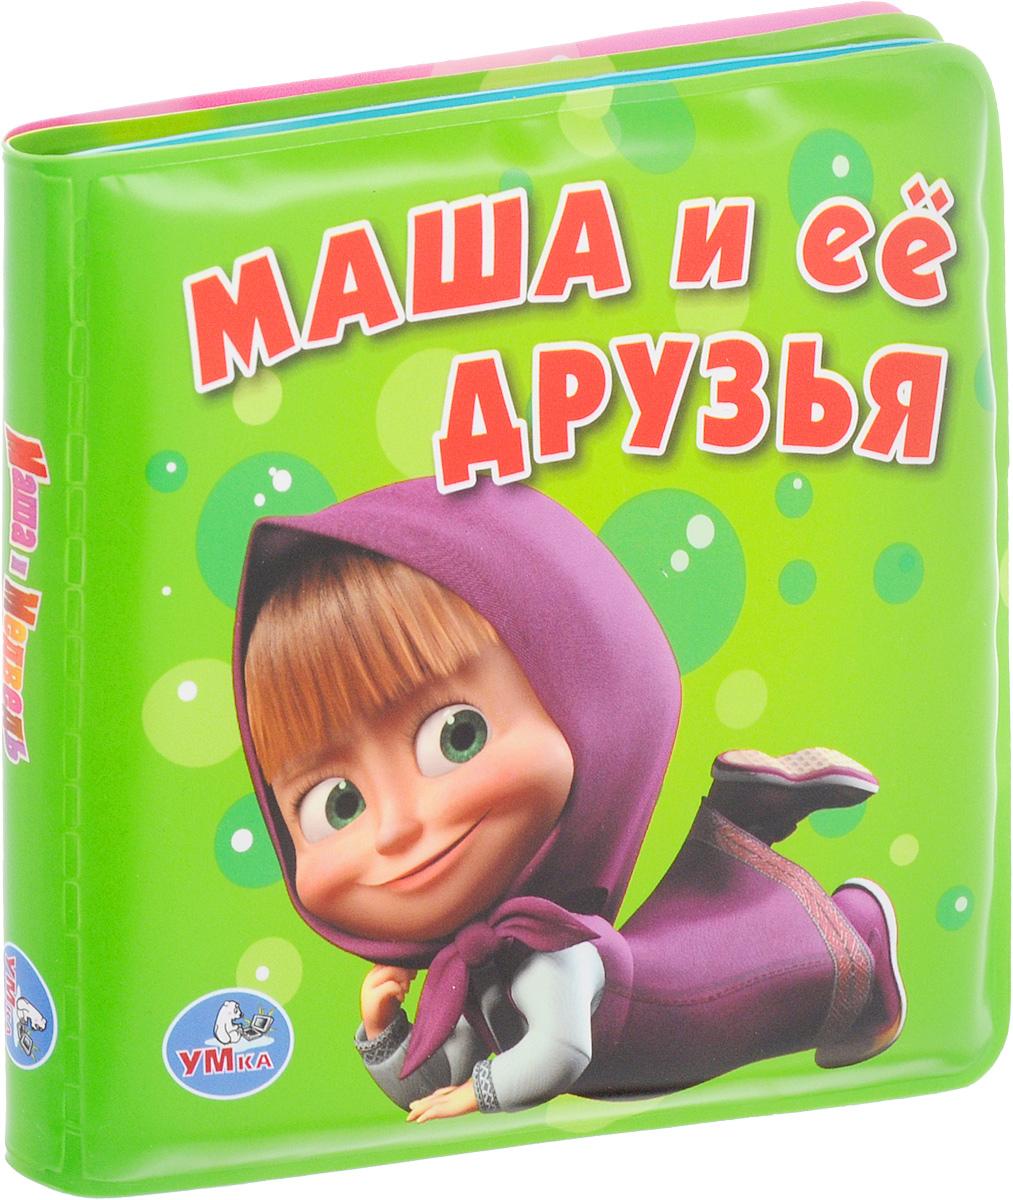 Умка Книжка-игрушка Маша и ее друзья умка развивающая игрушка фотоаппарат чебурашки